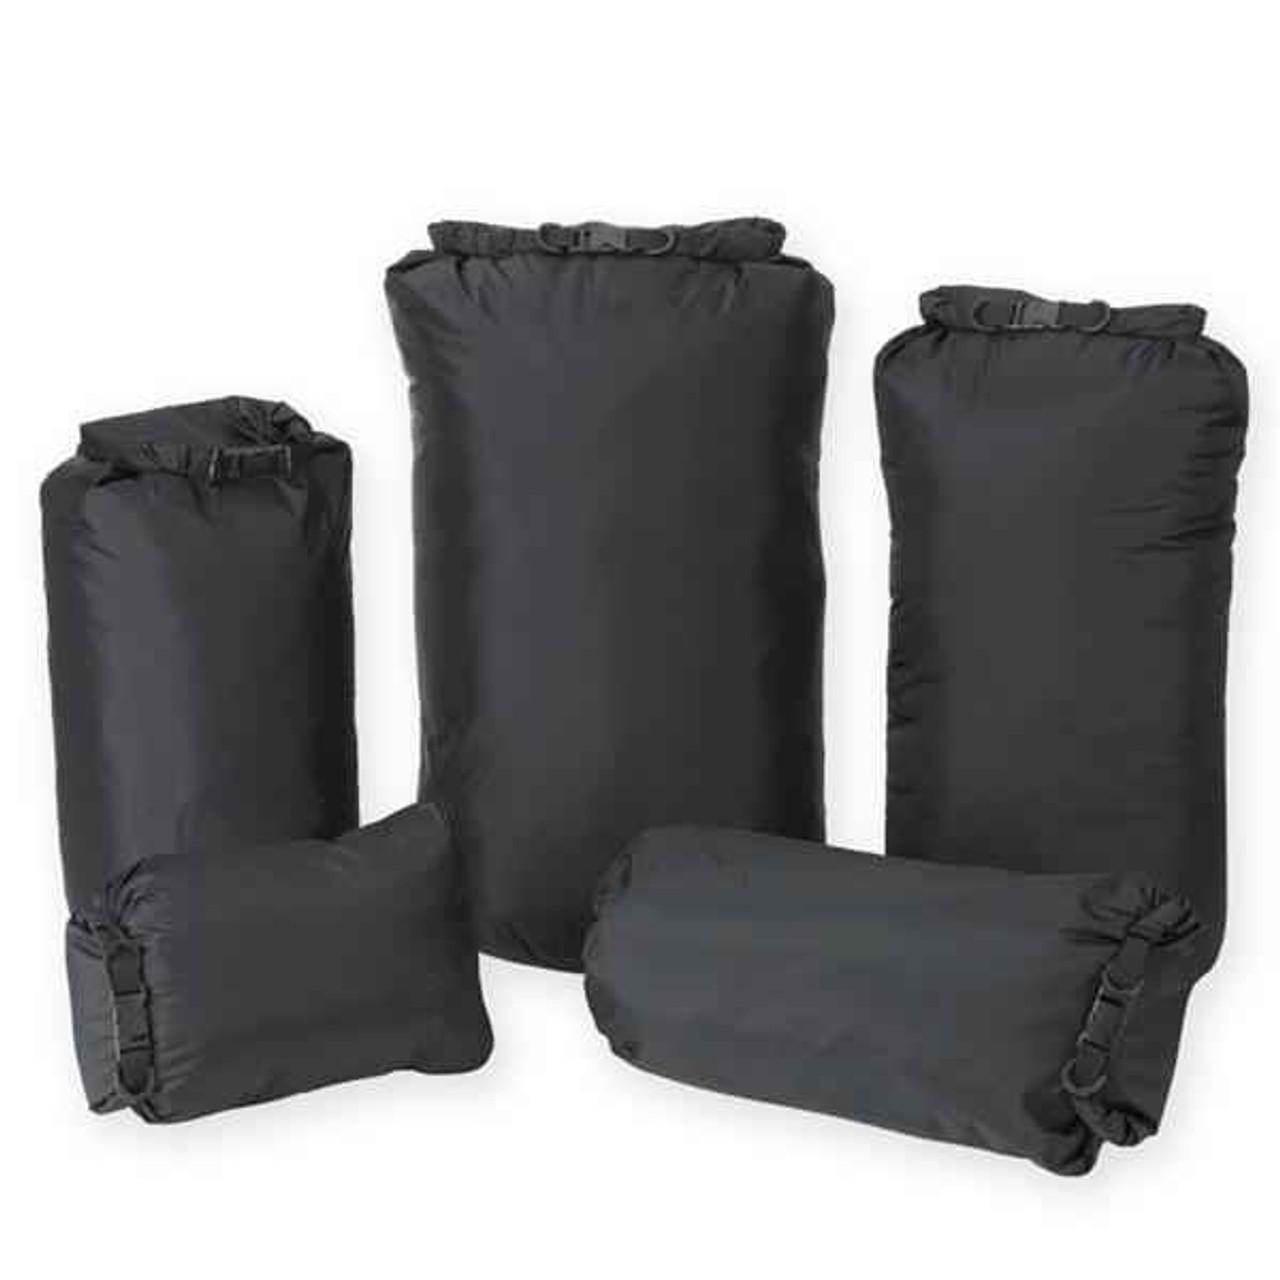 Pro Force Dri-Sak Waterproof Bag - Medium, Black